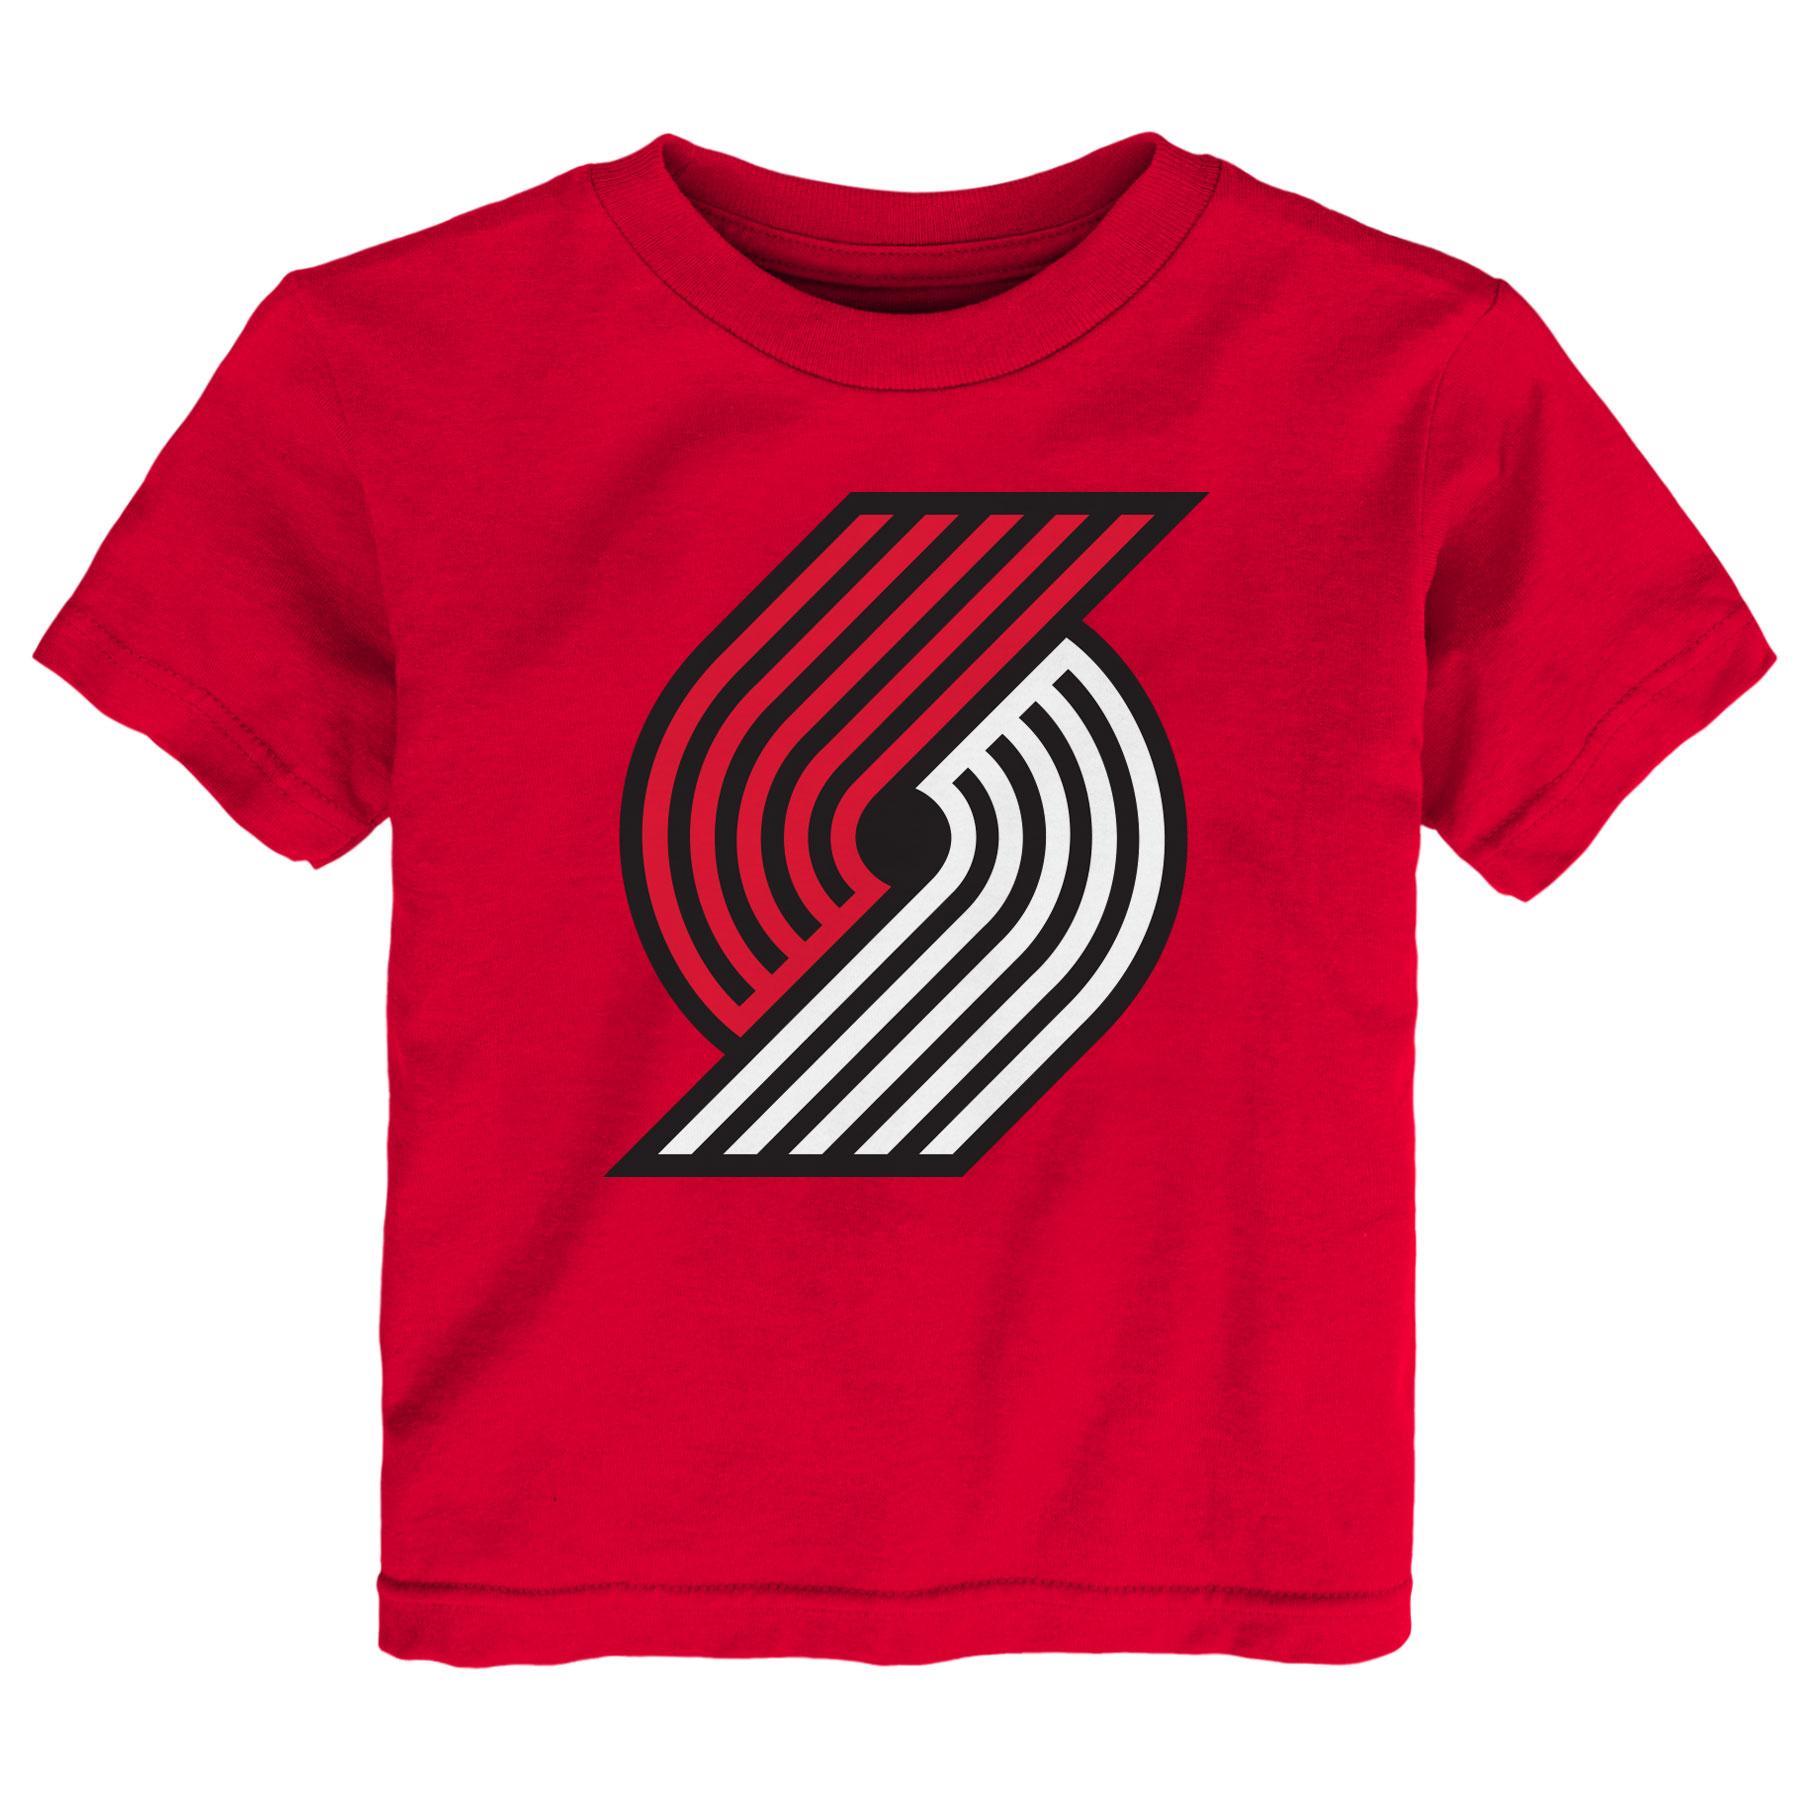 Camiseta con logotipo Portland Trail Blazers - Niñito